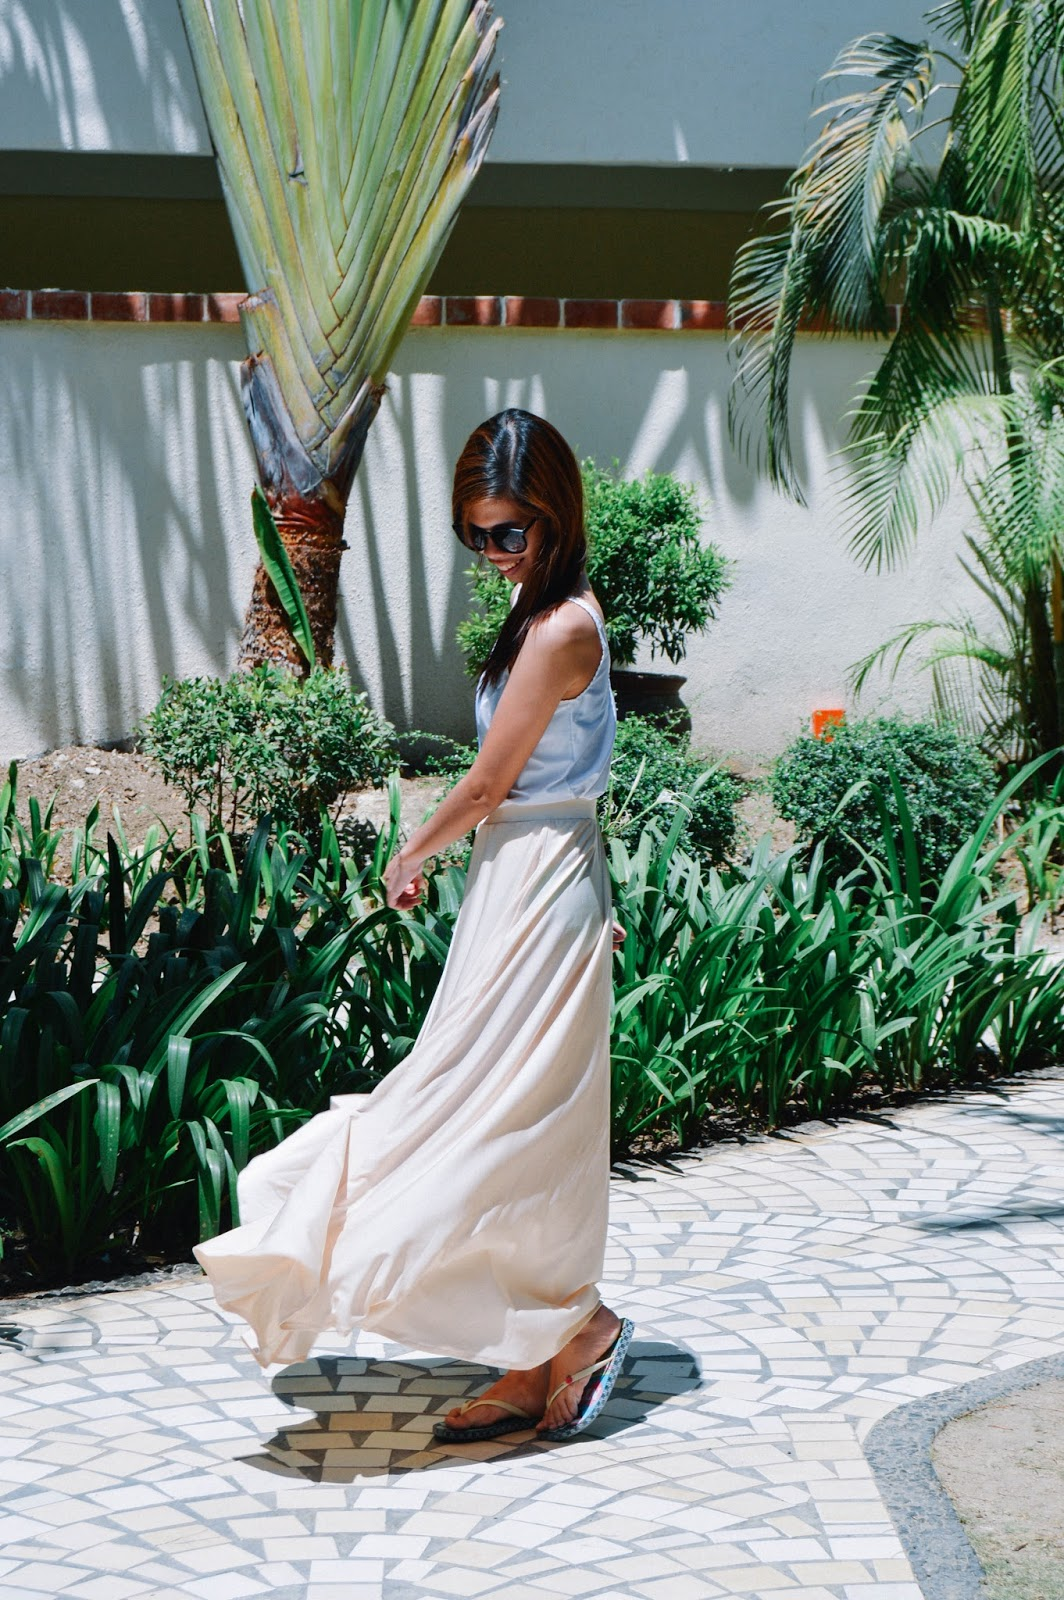 summer ootd, summer breeze, chill summer, summer, chill, Costabella Beach Resort, How to edit instagram photos, fashion blogger, style blogger, cebu blogger, cebu style blogger, blogger, filipina blogger, cebuana blogger, nested thoughts, katherine cutar, katherine anne cutar, katherineanika, katherine annika, ootd, ootd pilipinas, summer 2015, philippines summer 2015, philippines summer, cebu summer, cebu summer 2015, costabella cebu, triangl swimwear, triangl cebu, triangl, triangl swimwear philippines, bikini ph, bikini cebu